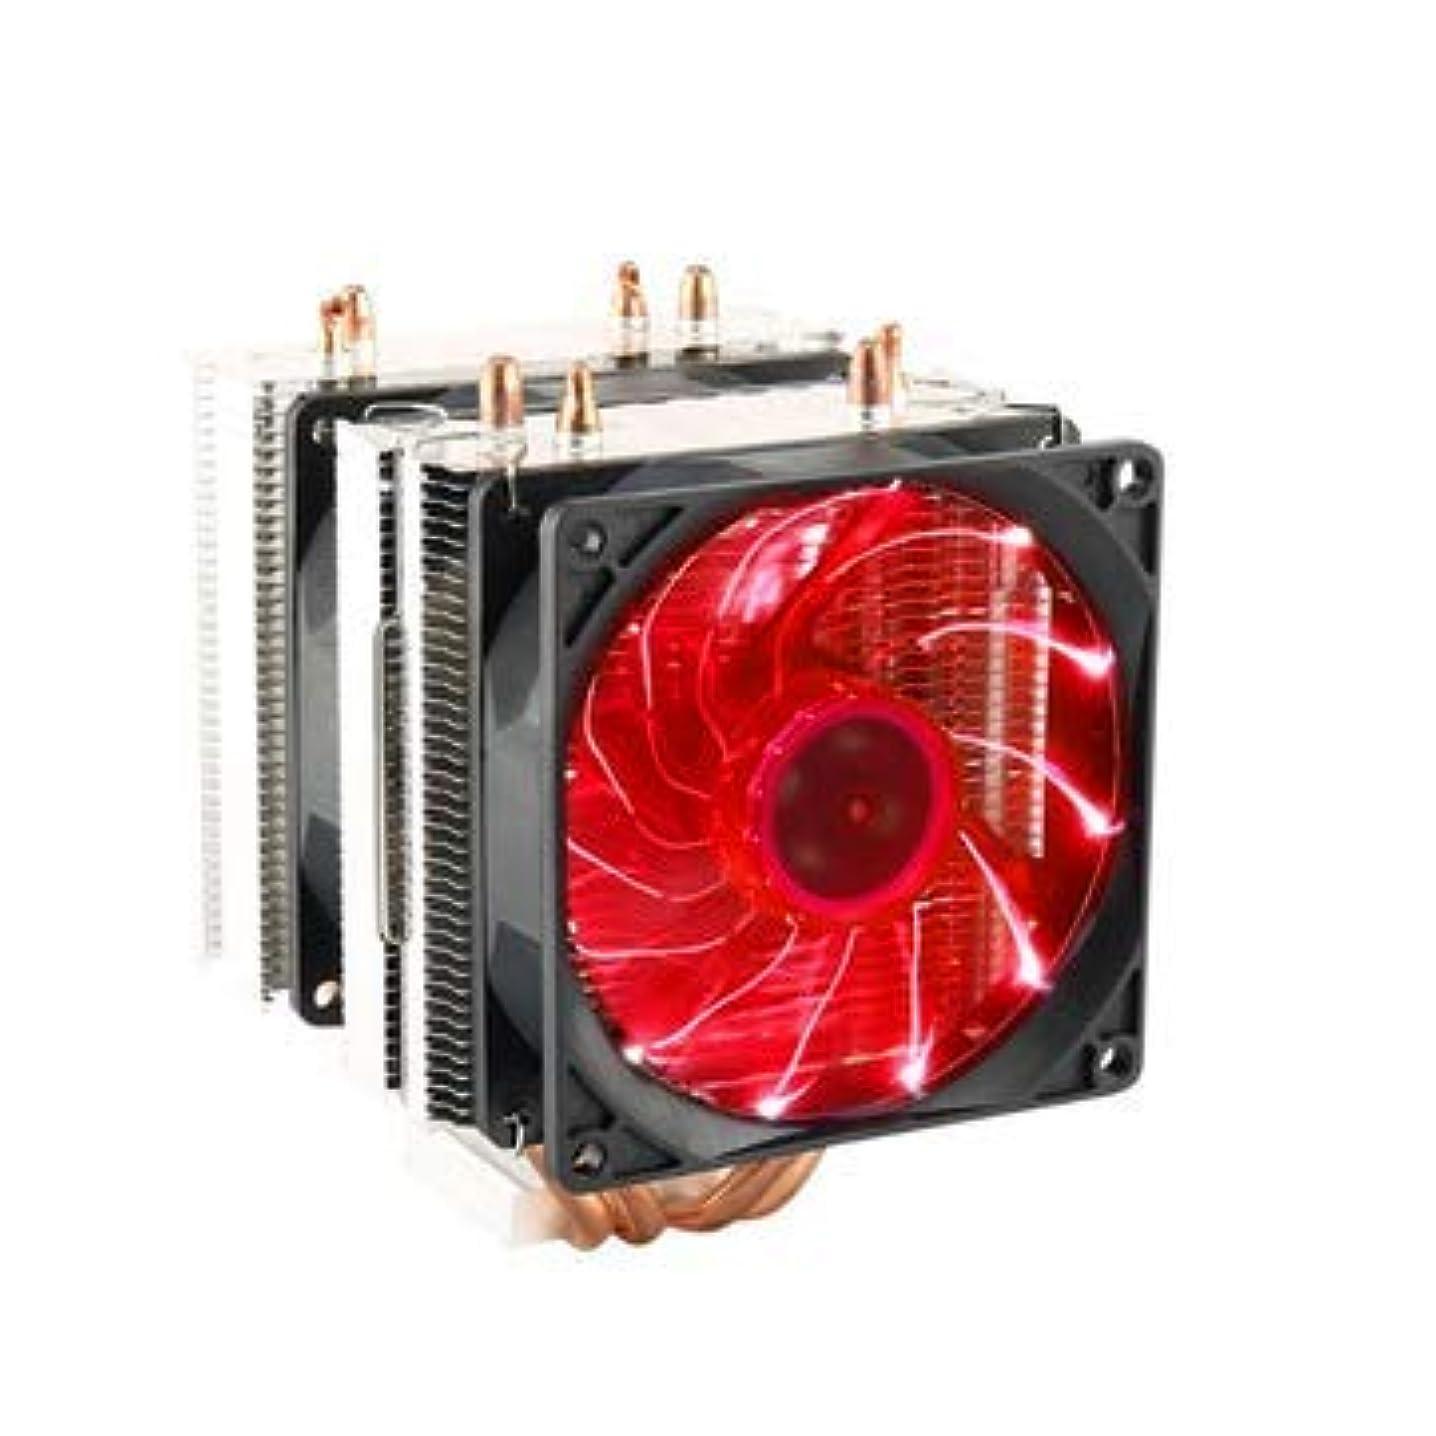 3 Pin 90mm LED CPU Cooling Fan Cooler Radiator for LGA2011 LGA1155 AMD3+ AMD2 - Computer Components CPU Cooling Fans - (Red) - 1 LED CPU Heatsink, 1 Thermal Grease, 1 Bracket